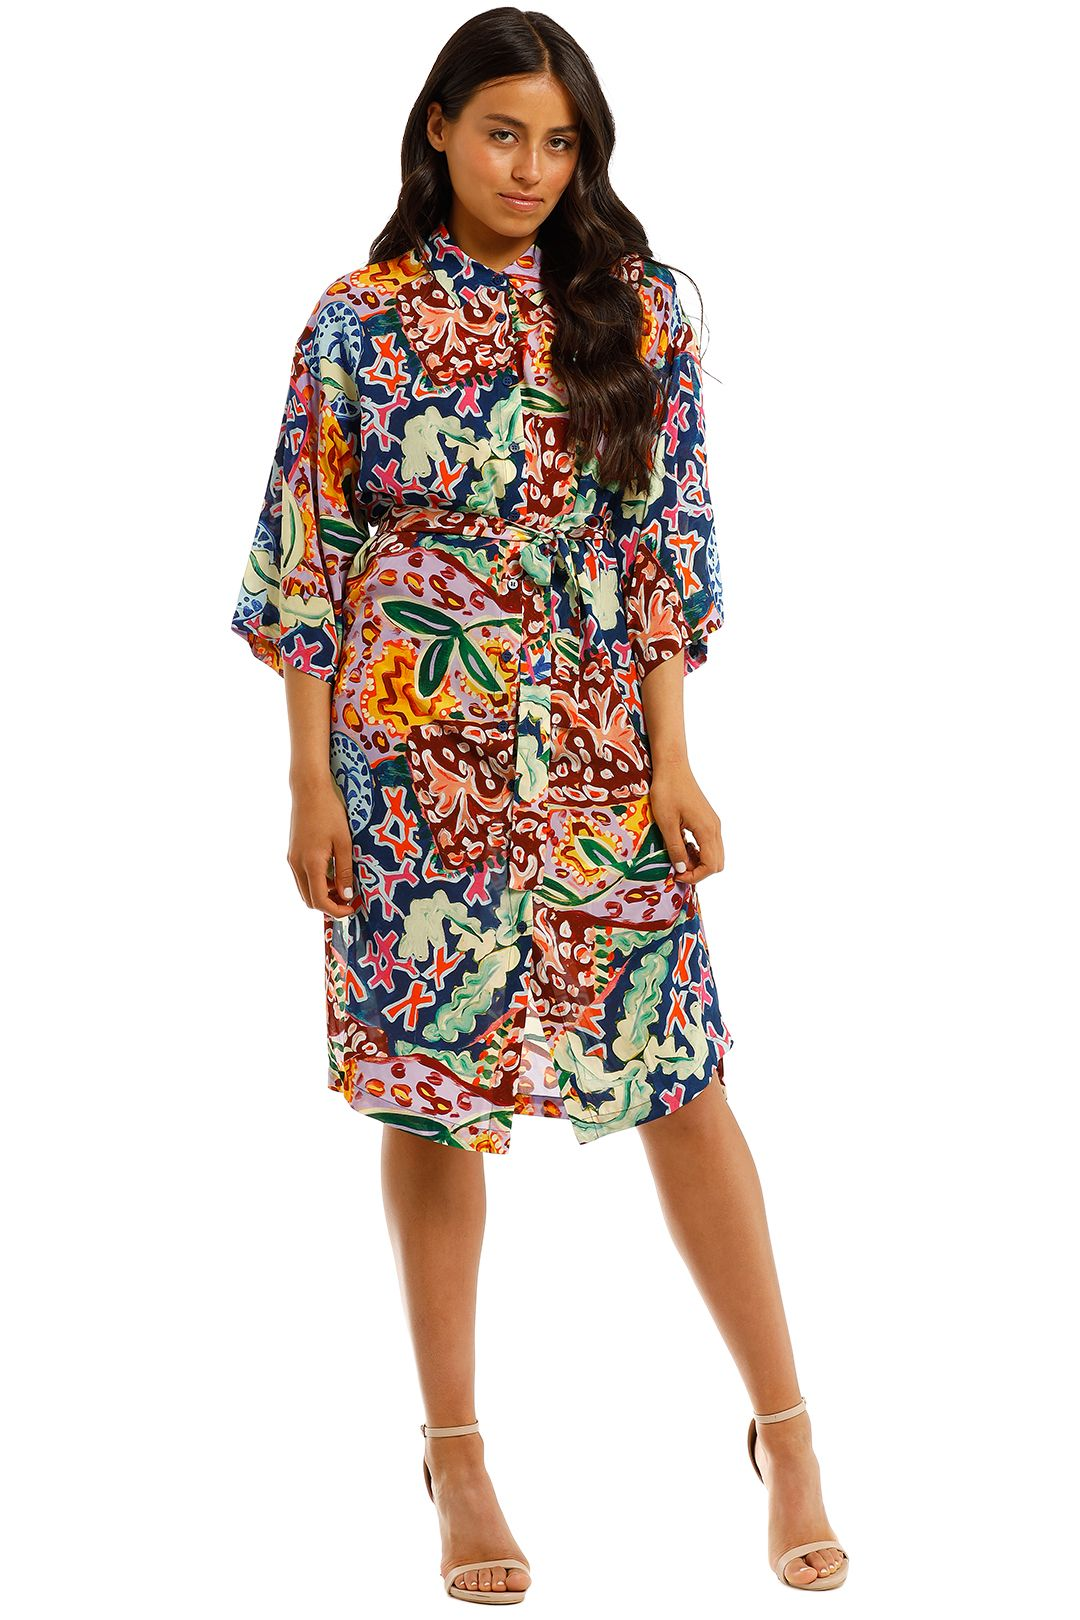 Gorman-Paradiso-Dress-Multi-Print-Front